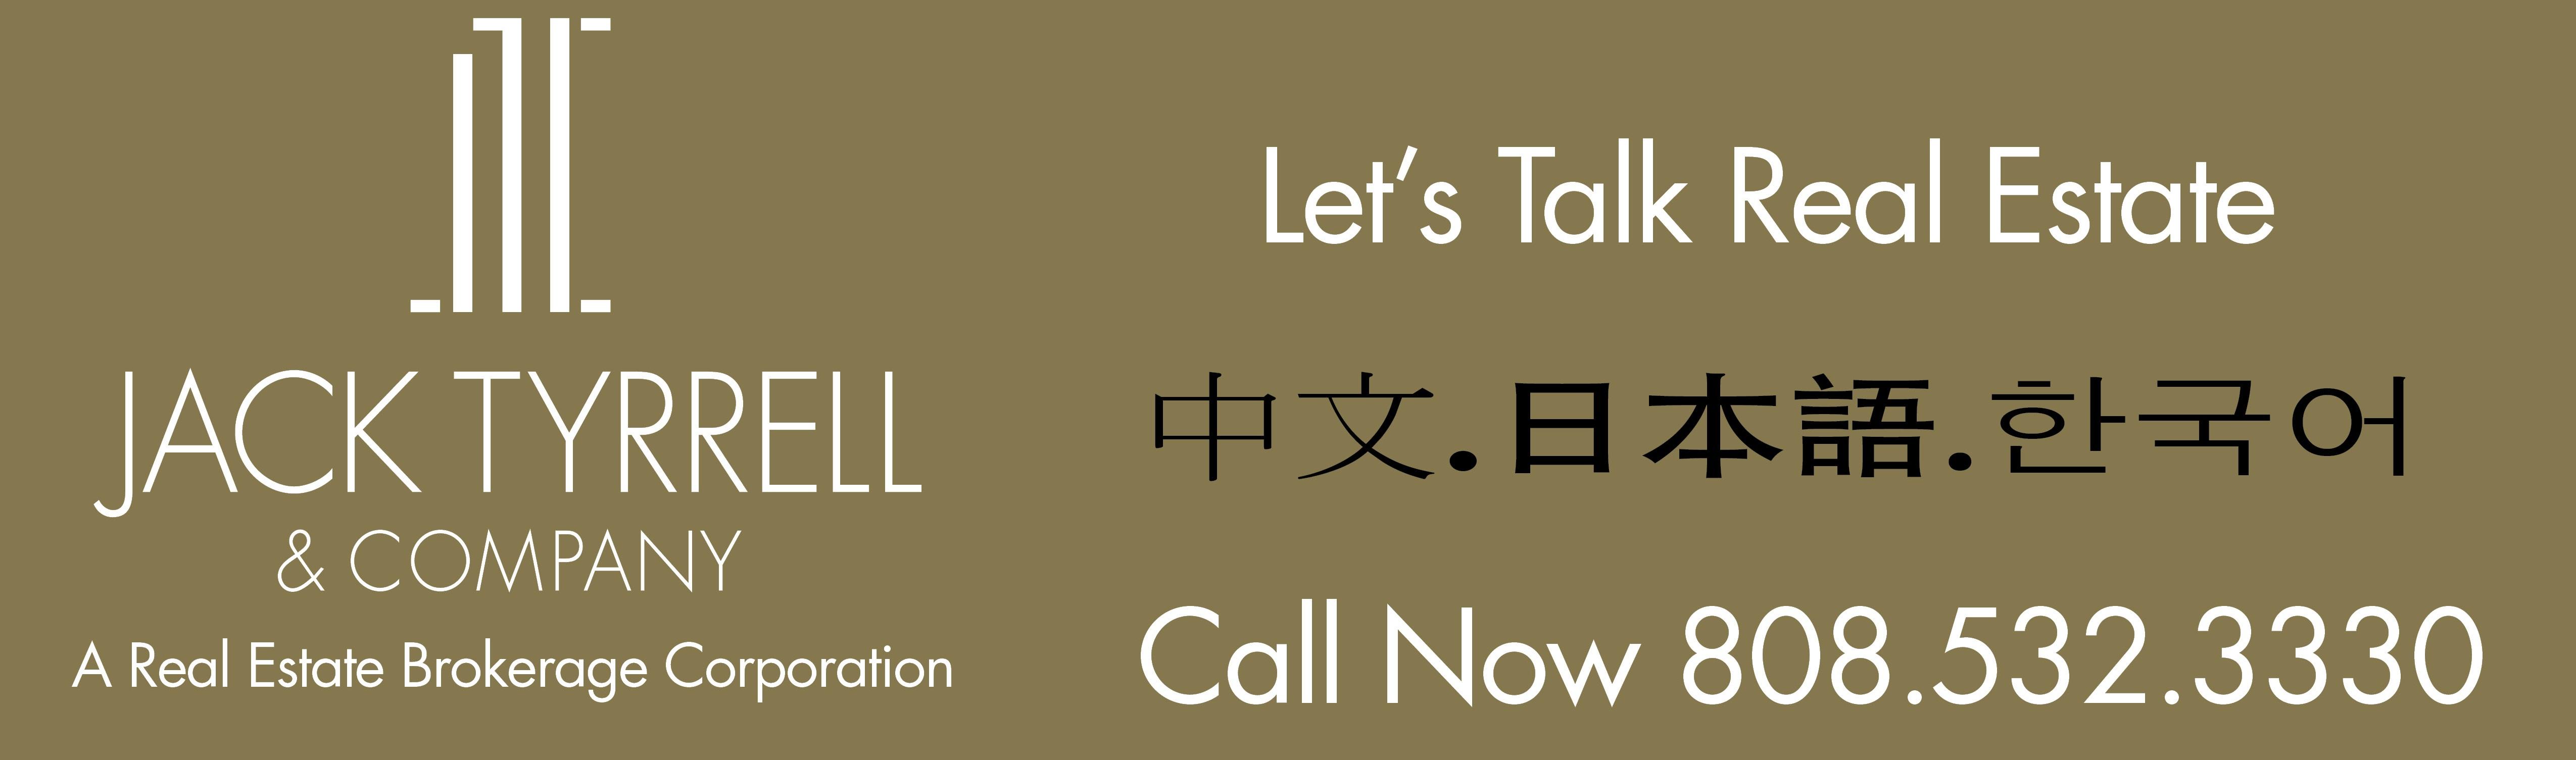 JTC banner-Languages.jpg